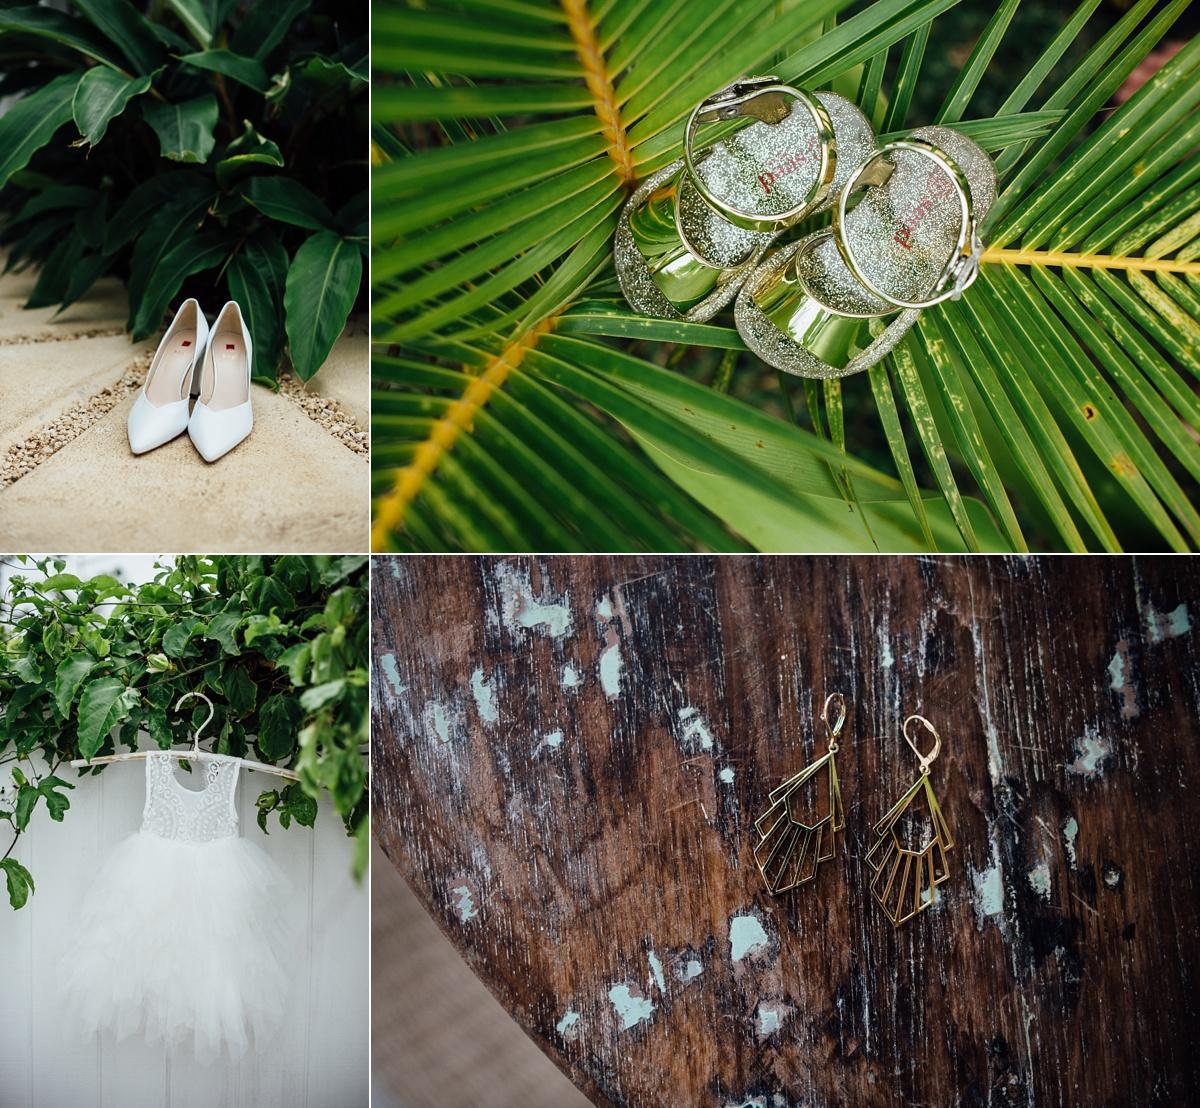 mark-kate-wedding-tamanu-vanuatu-groovy-banana-1.jpg